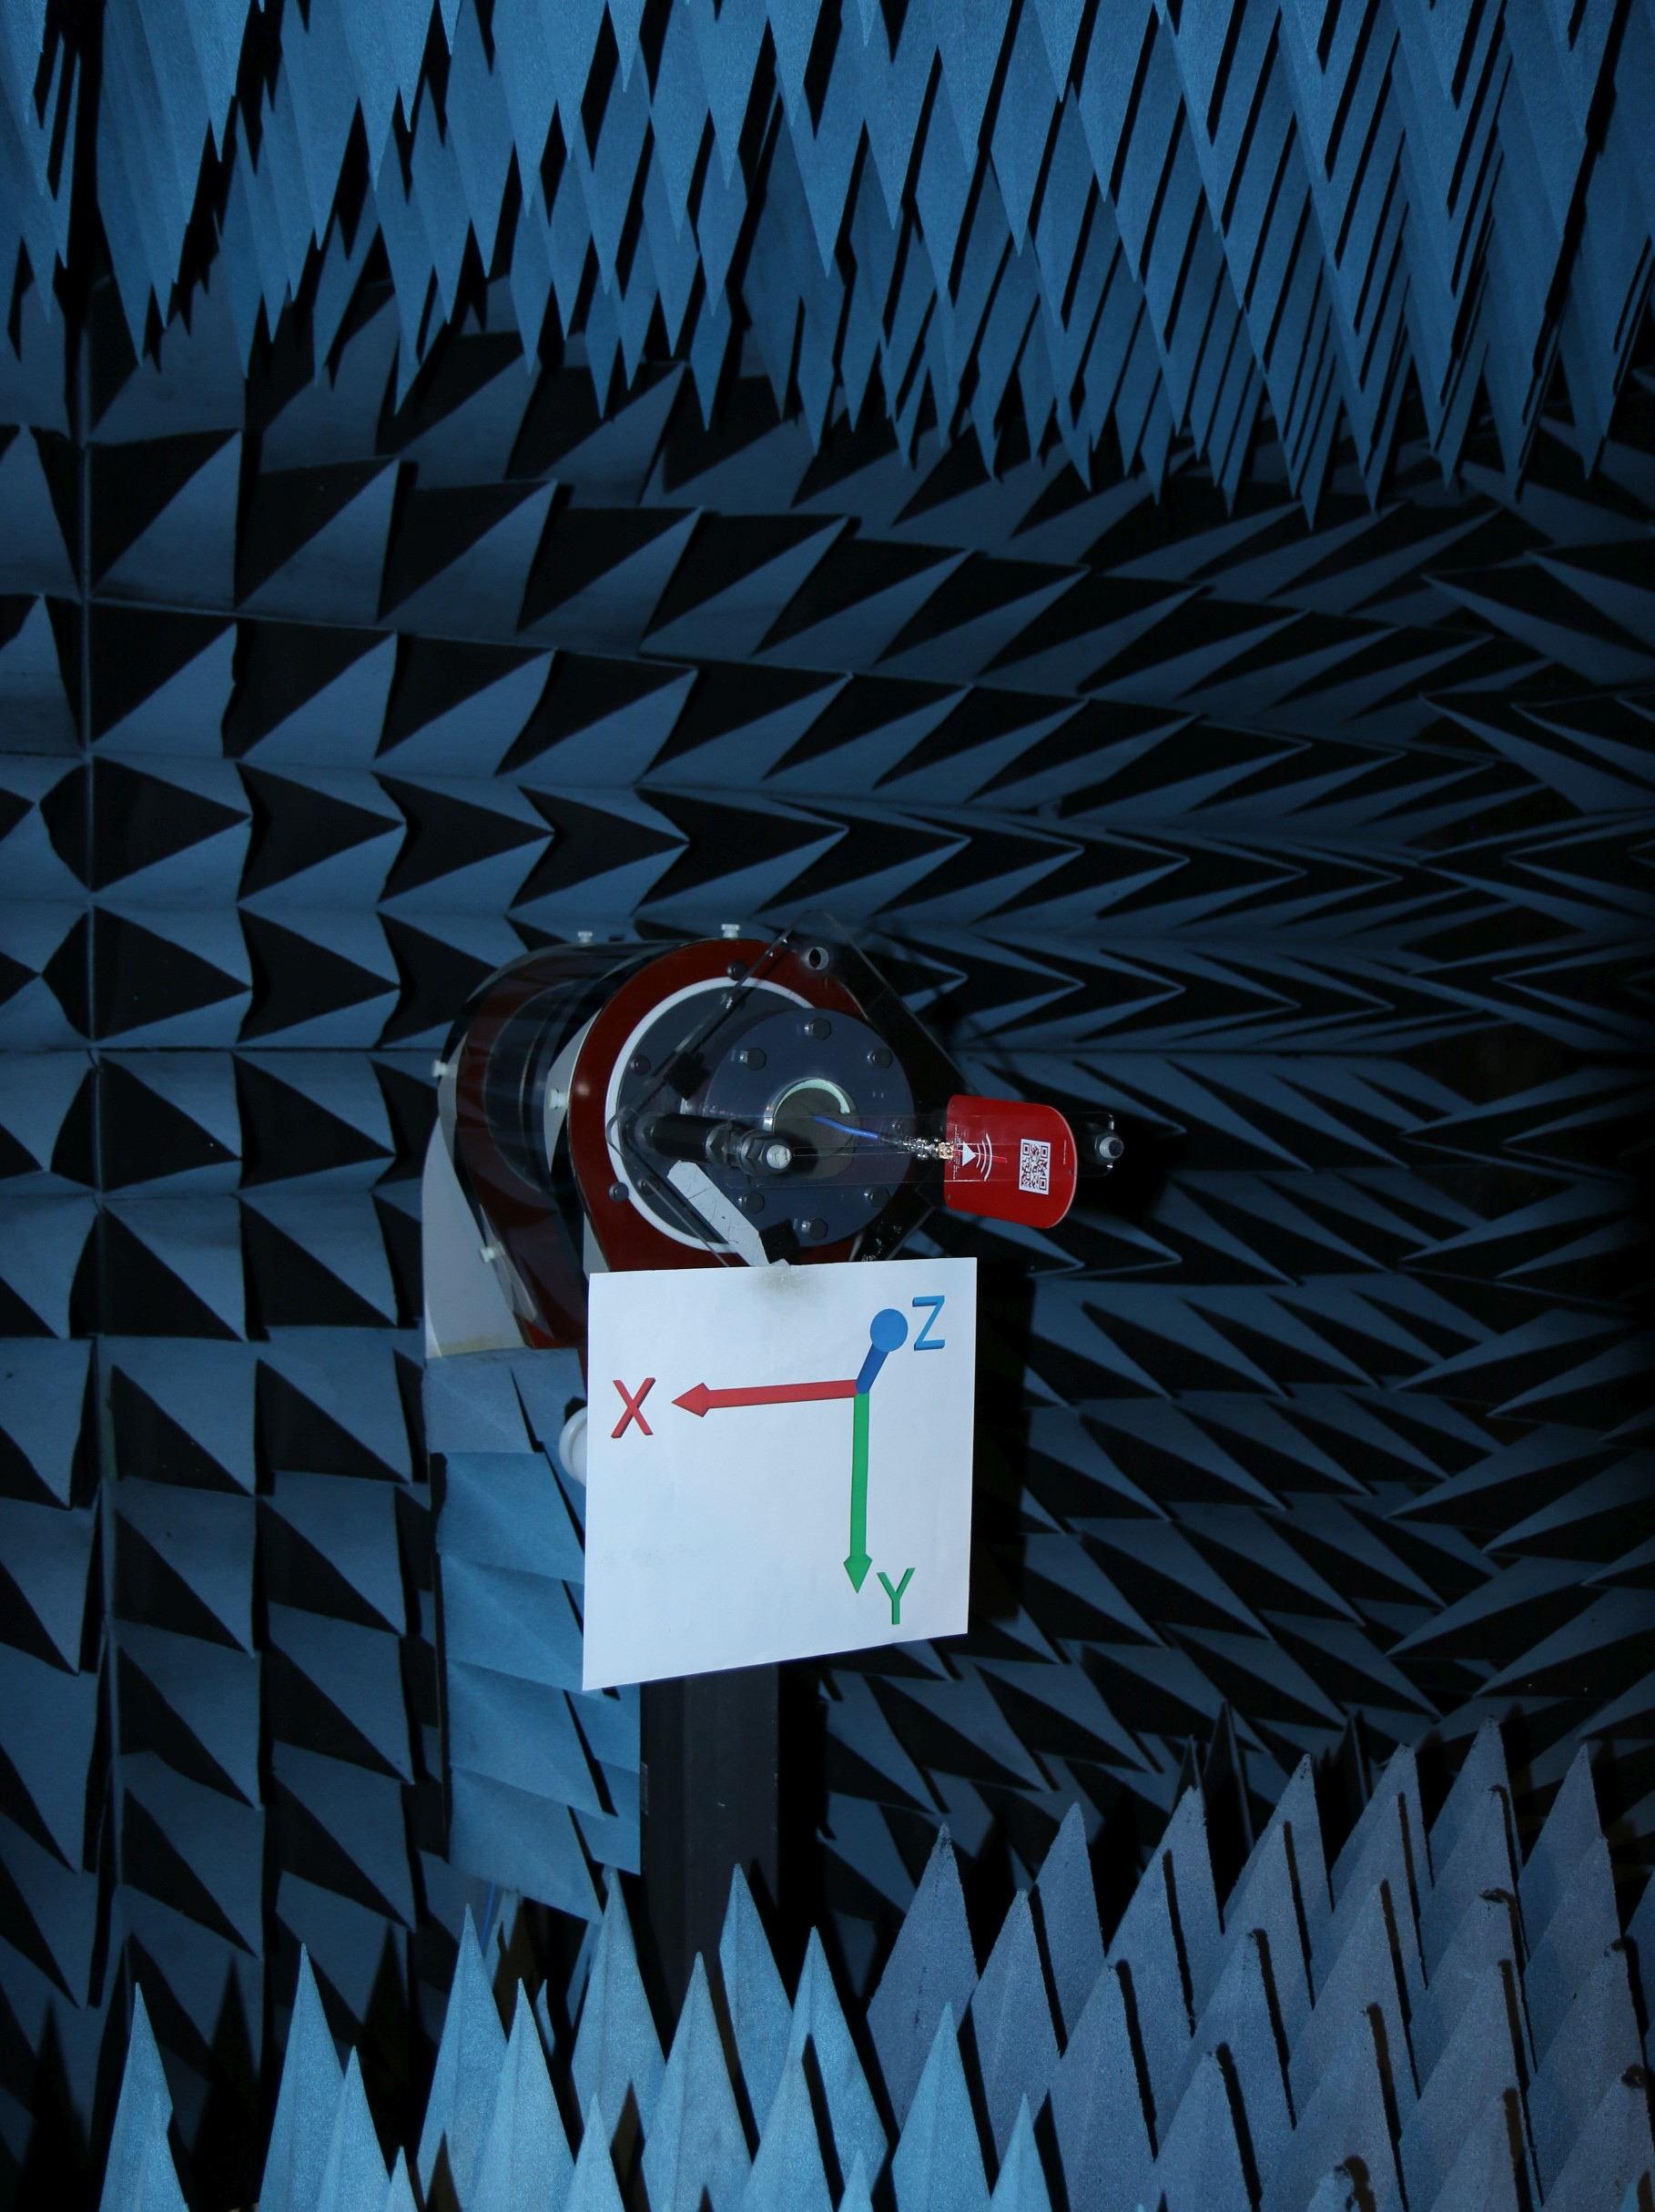 RFSpace DIP1400A Gain Testing Setup Anechoic Chamber View-1